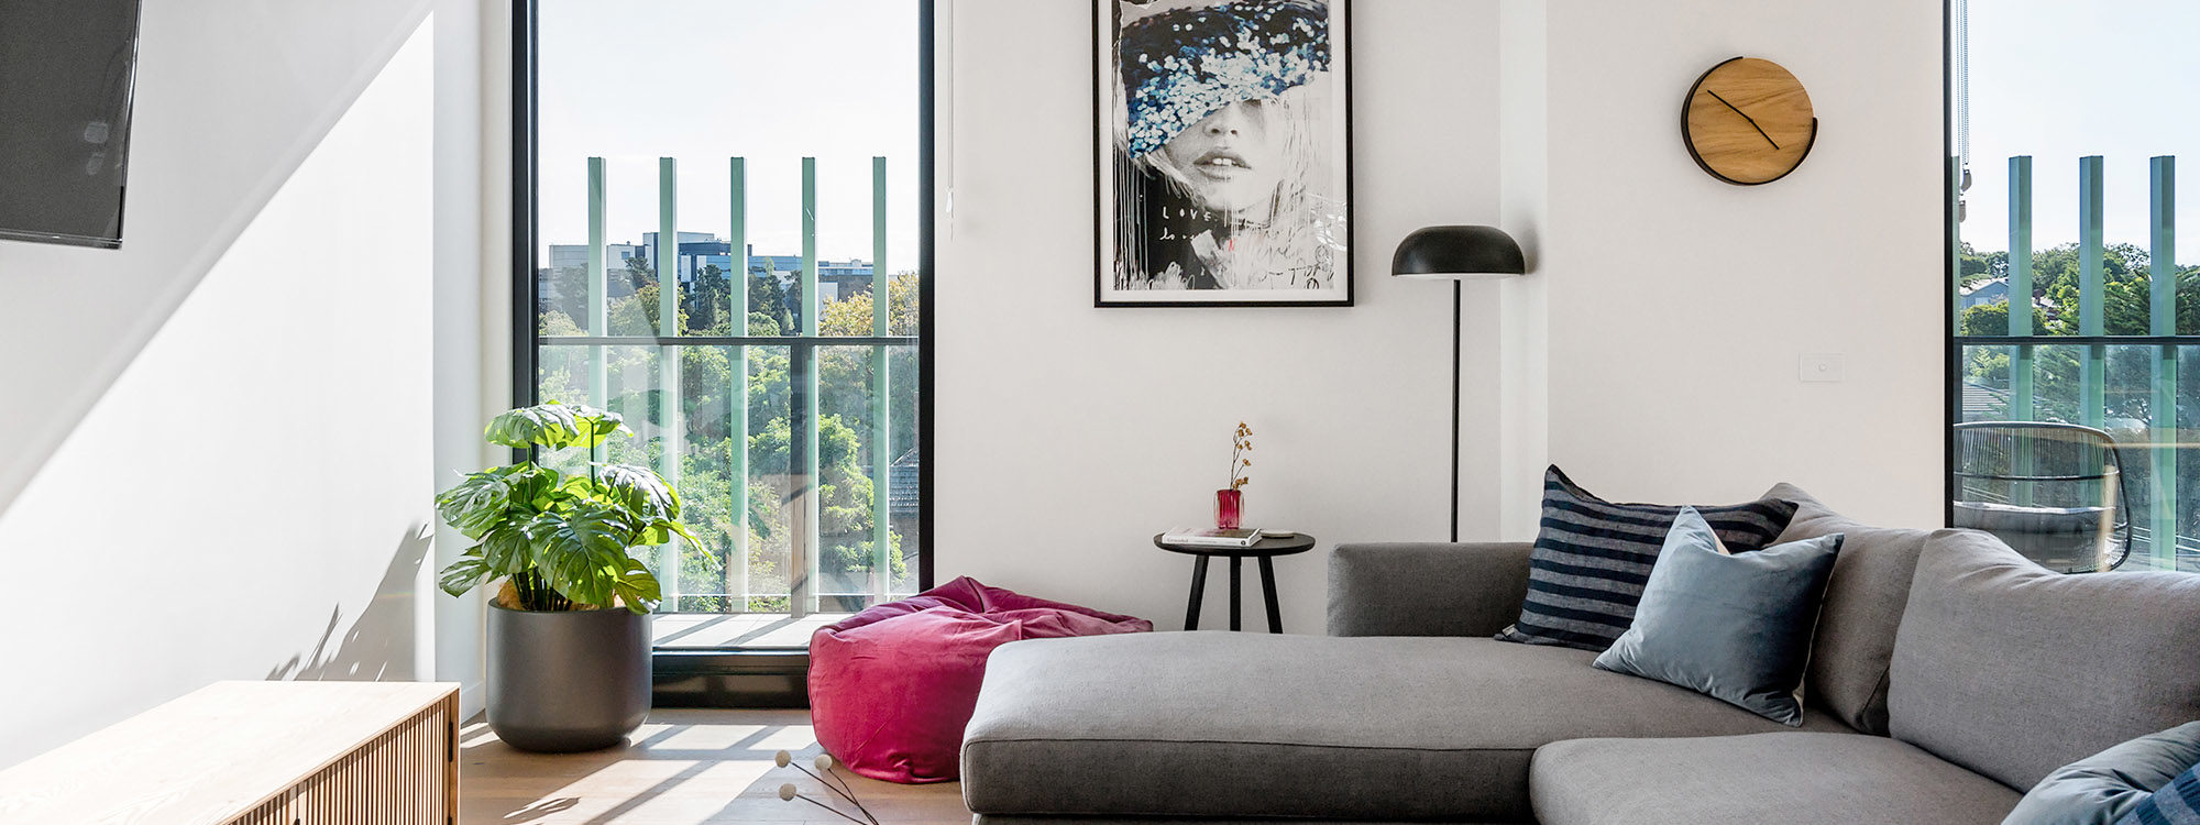 Axel Apartments 203 The Bonfield - Glen Iris - Living b